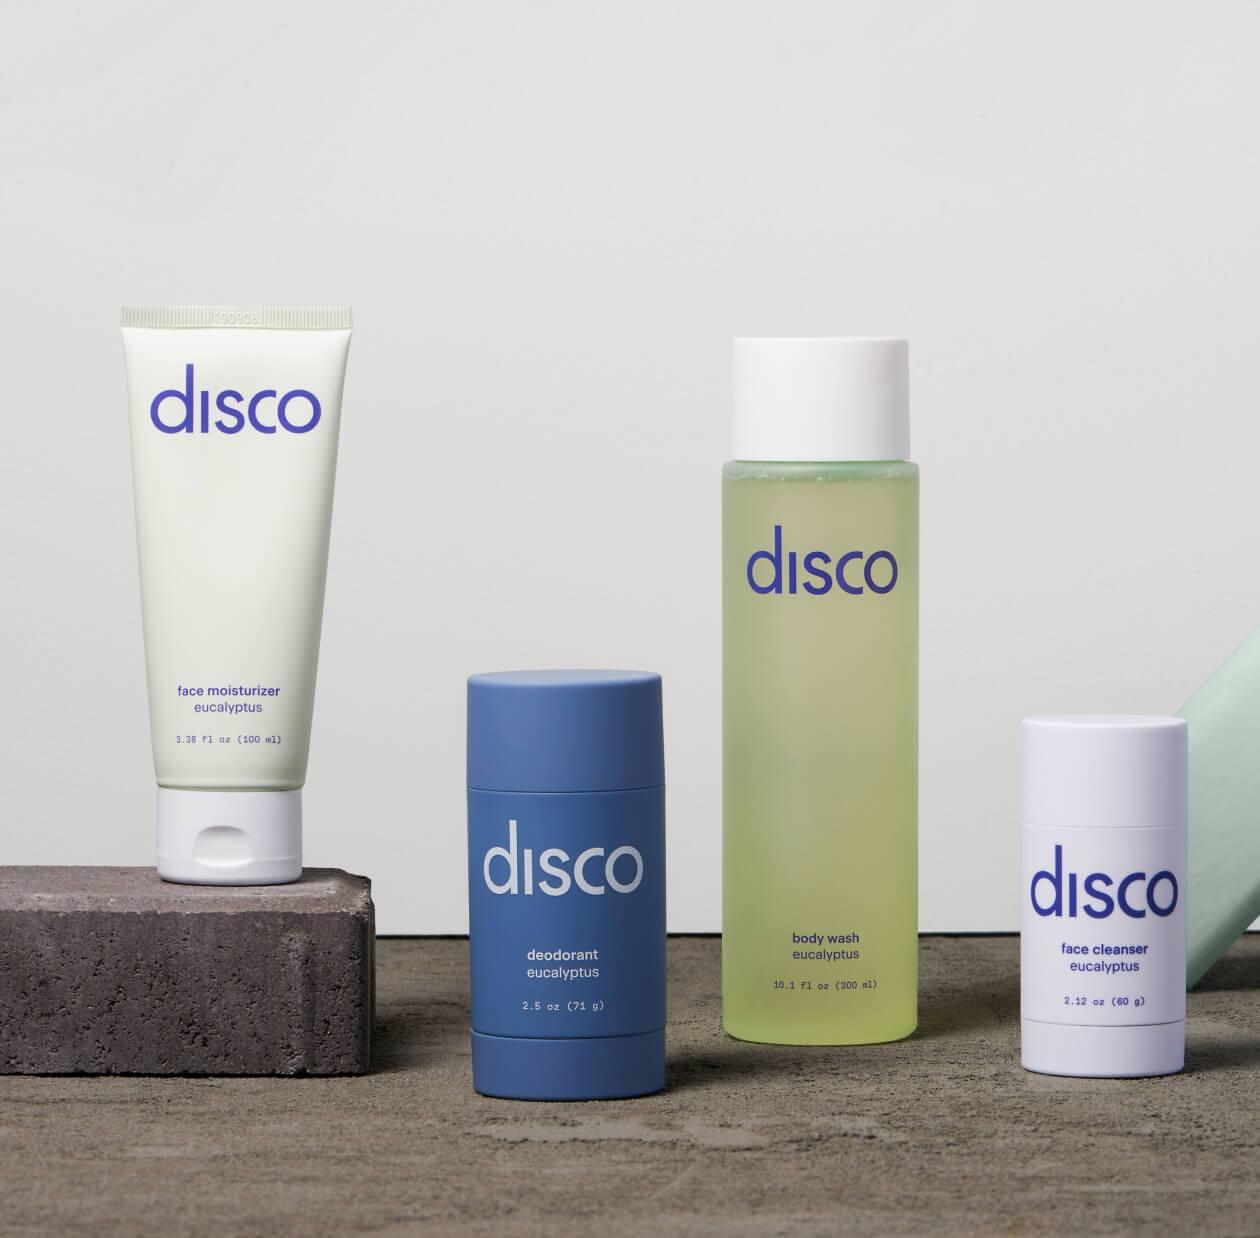 Best Men's Skincare Brands - Disco